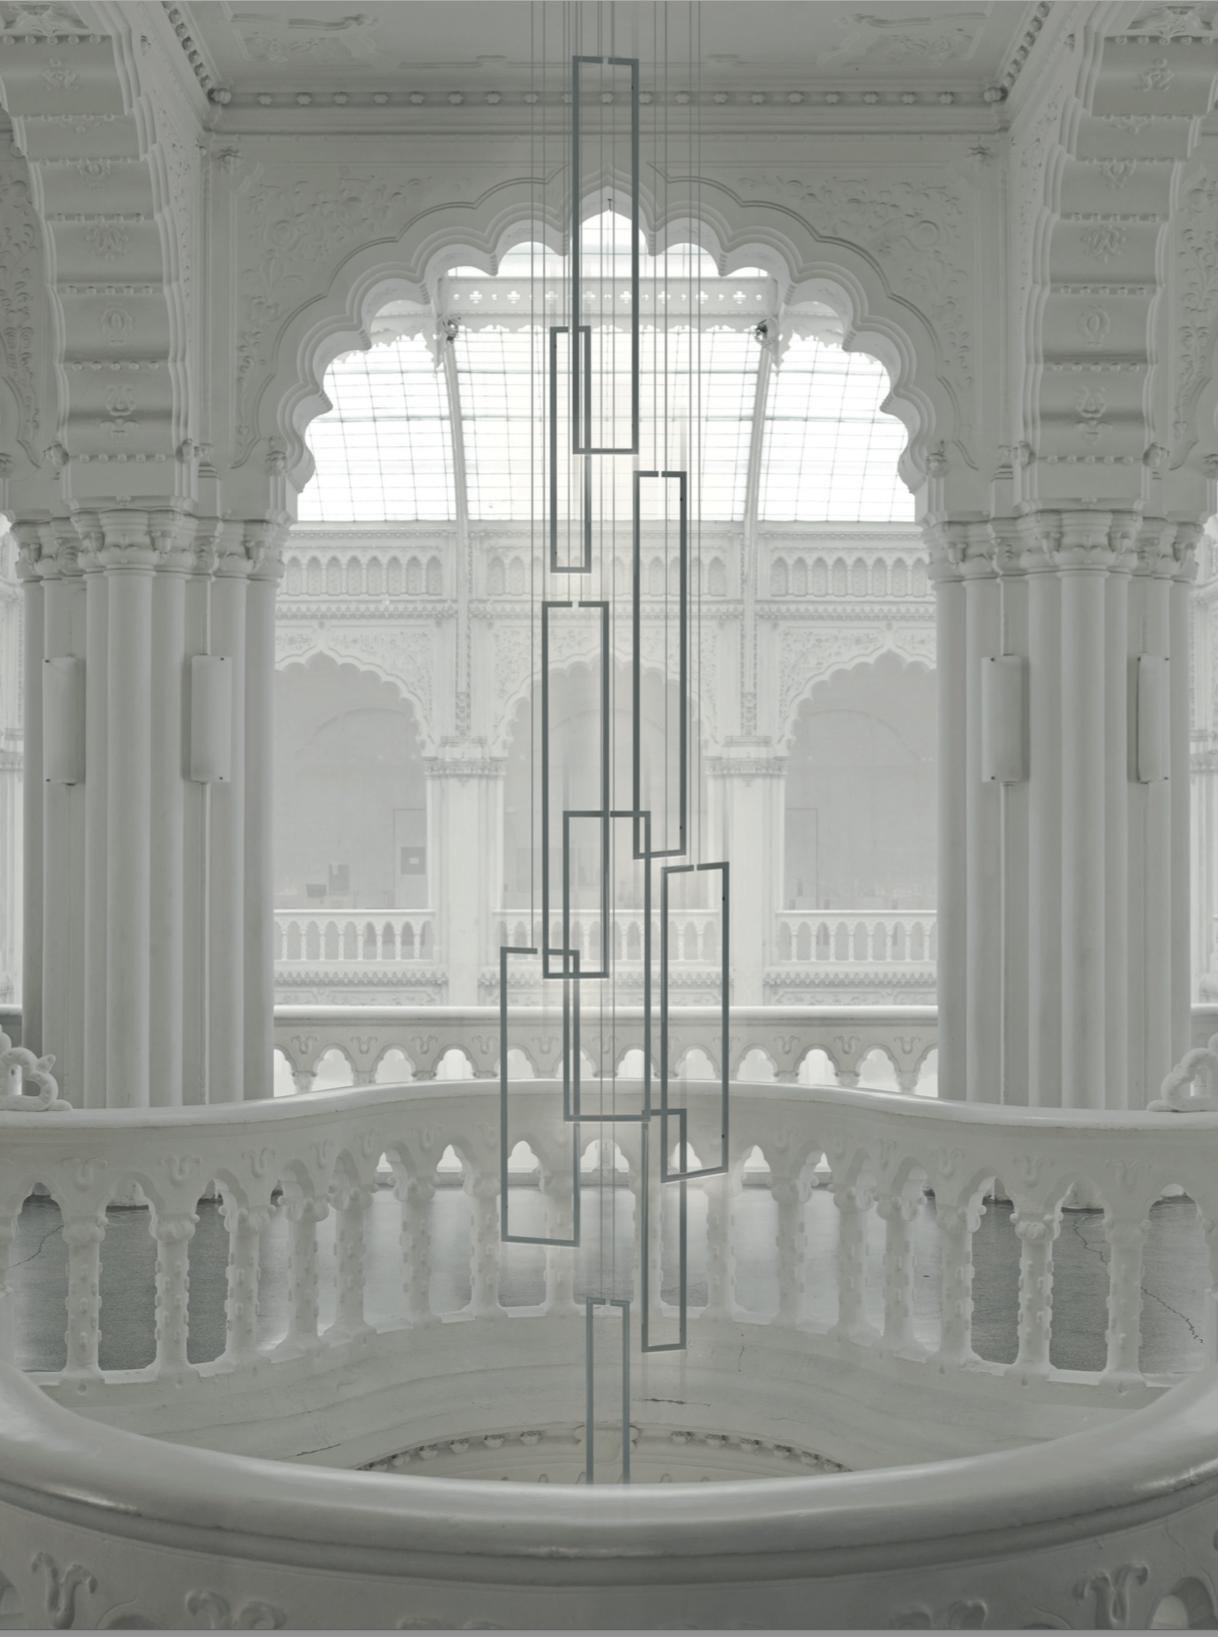 Room Lighting Design Software: FRAME Suspended, Open Aluminium Frames With LED Lights